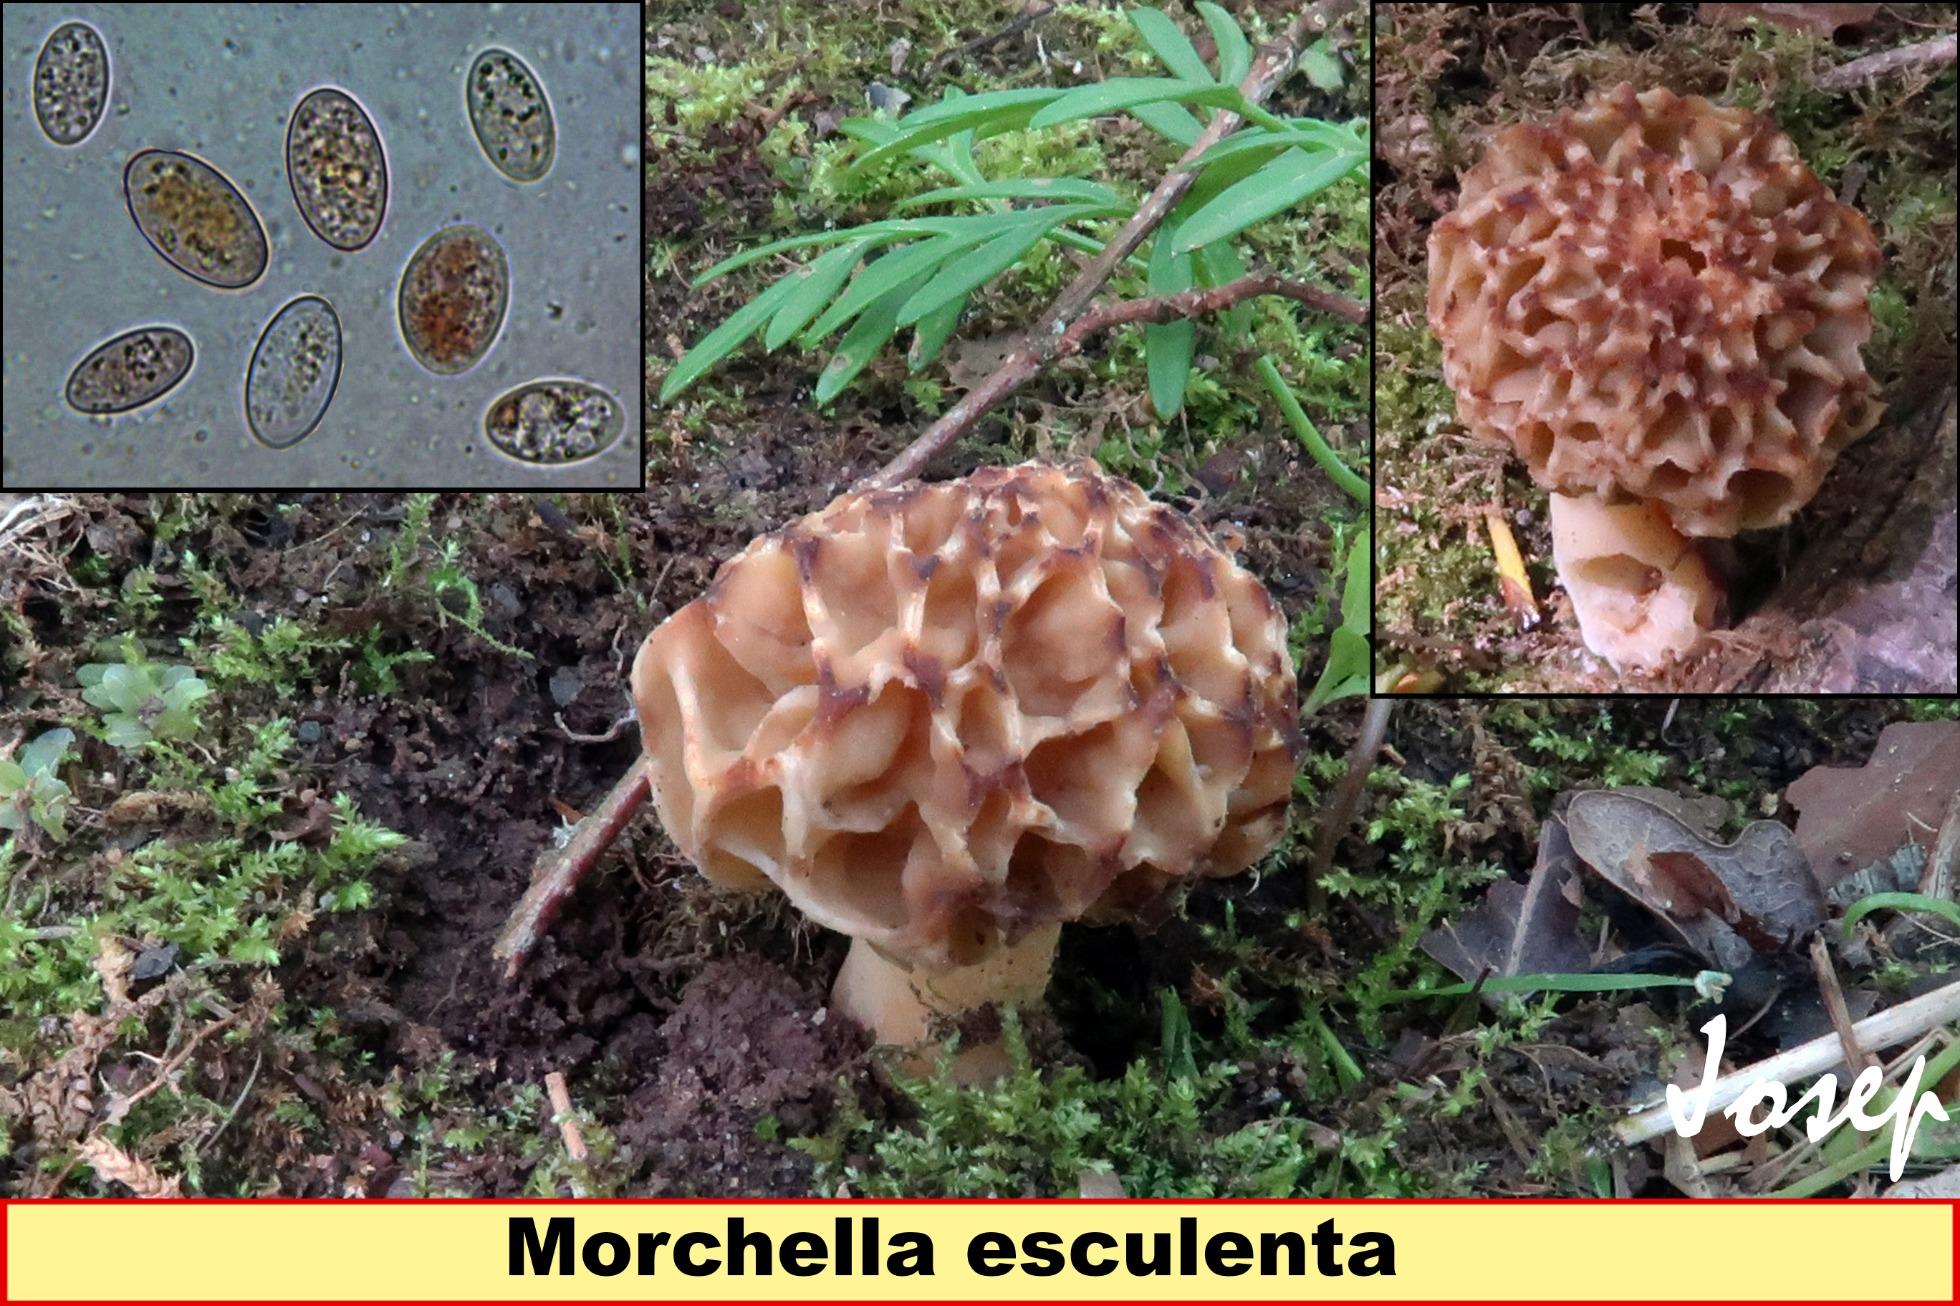 Morchellaesculenta_2019-05-18.jpg